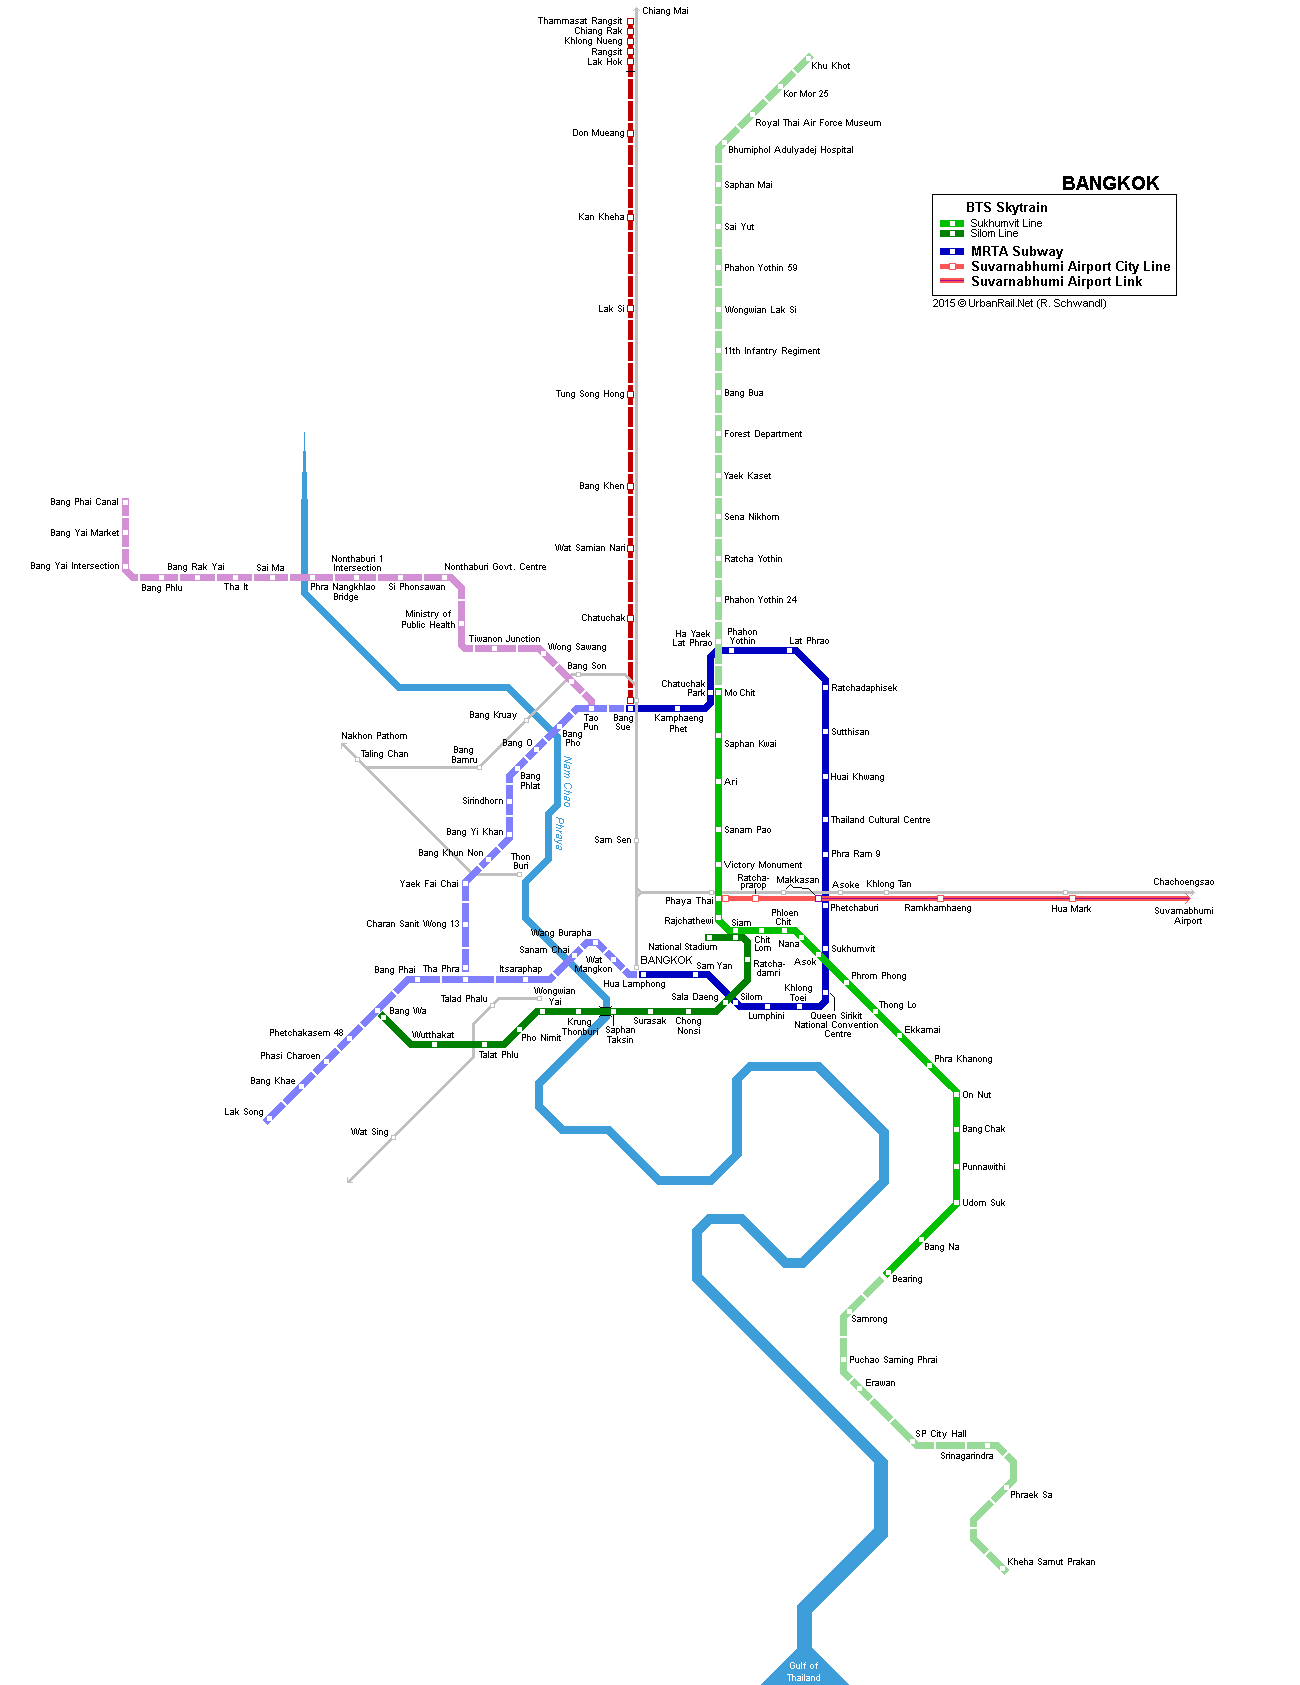 BTS Skytrain Bangkok Lines Map OAT SEAsia trip Pinterest Bangkok